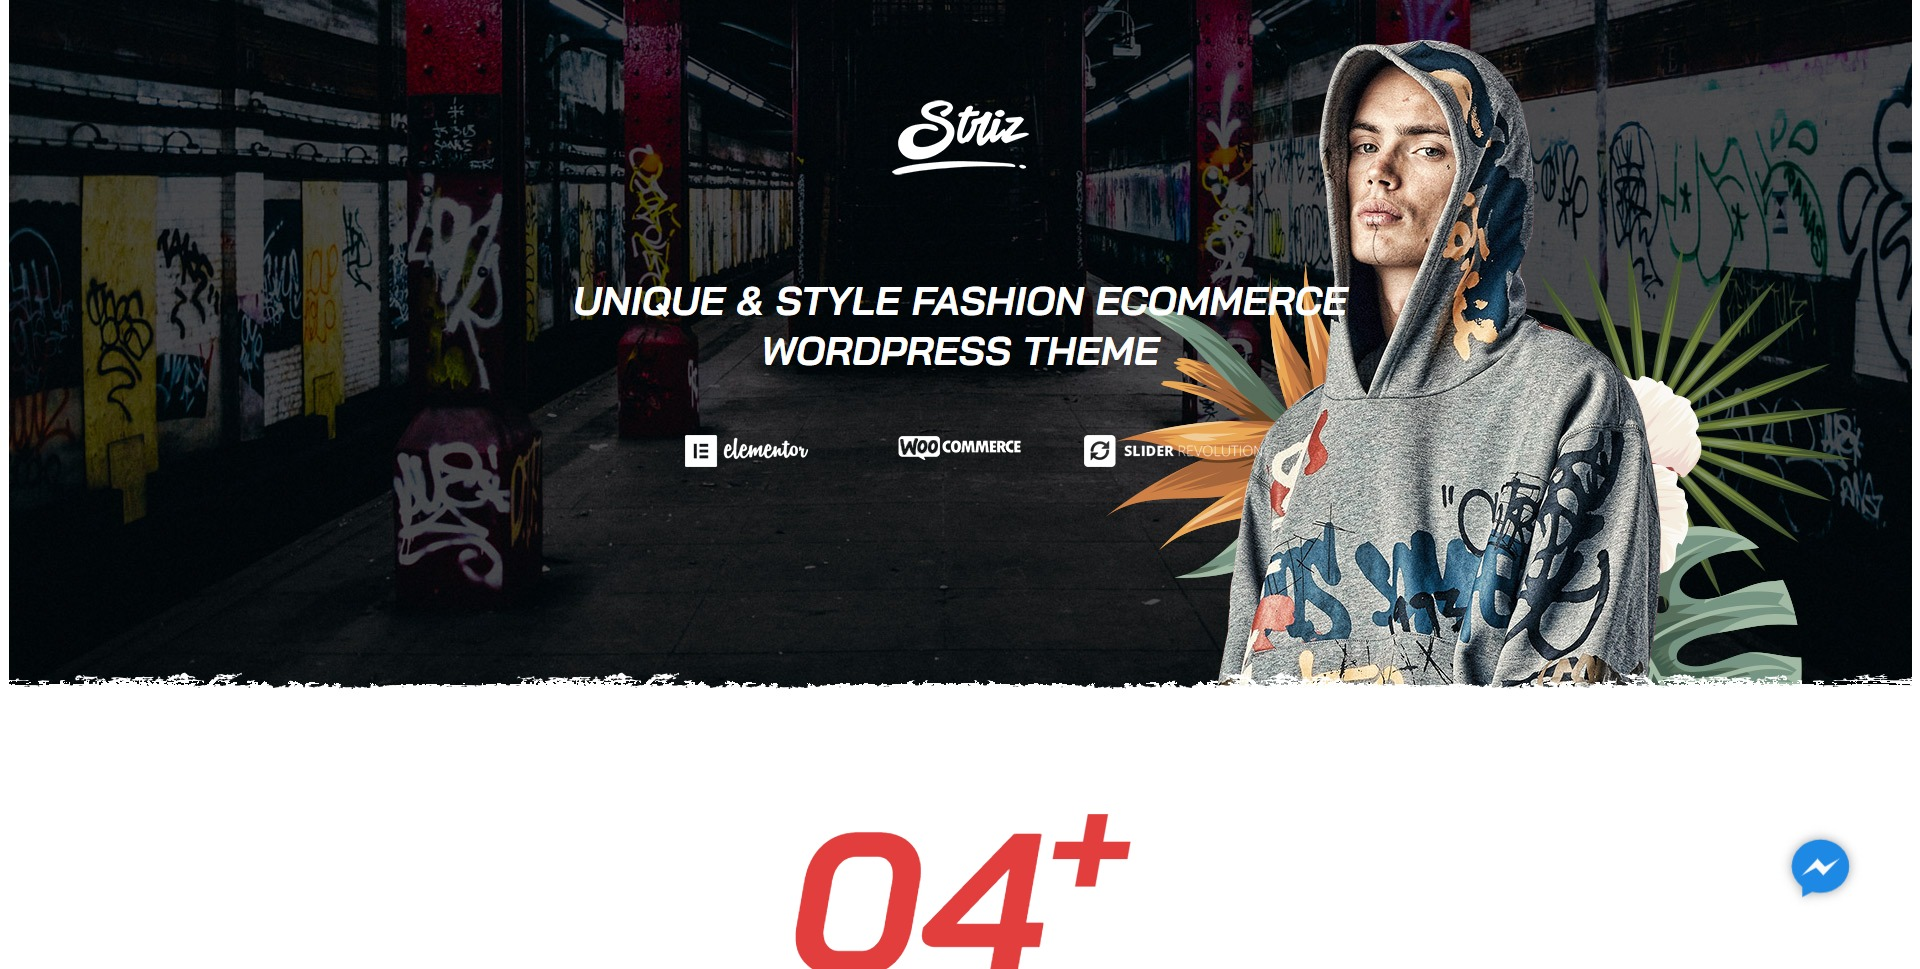 Striz-时尚潮牌服饰在线商城WordPress主题